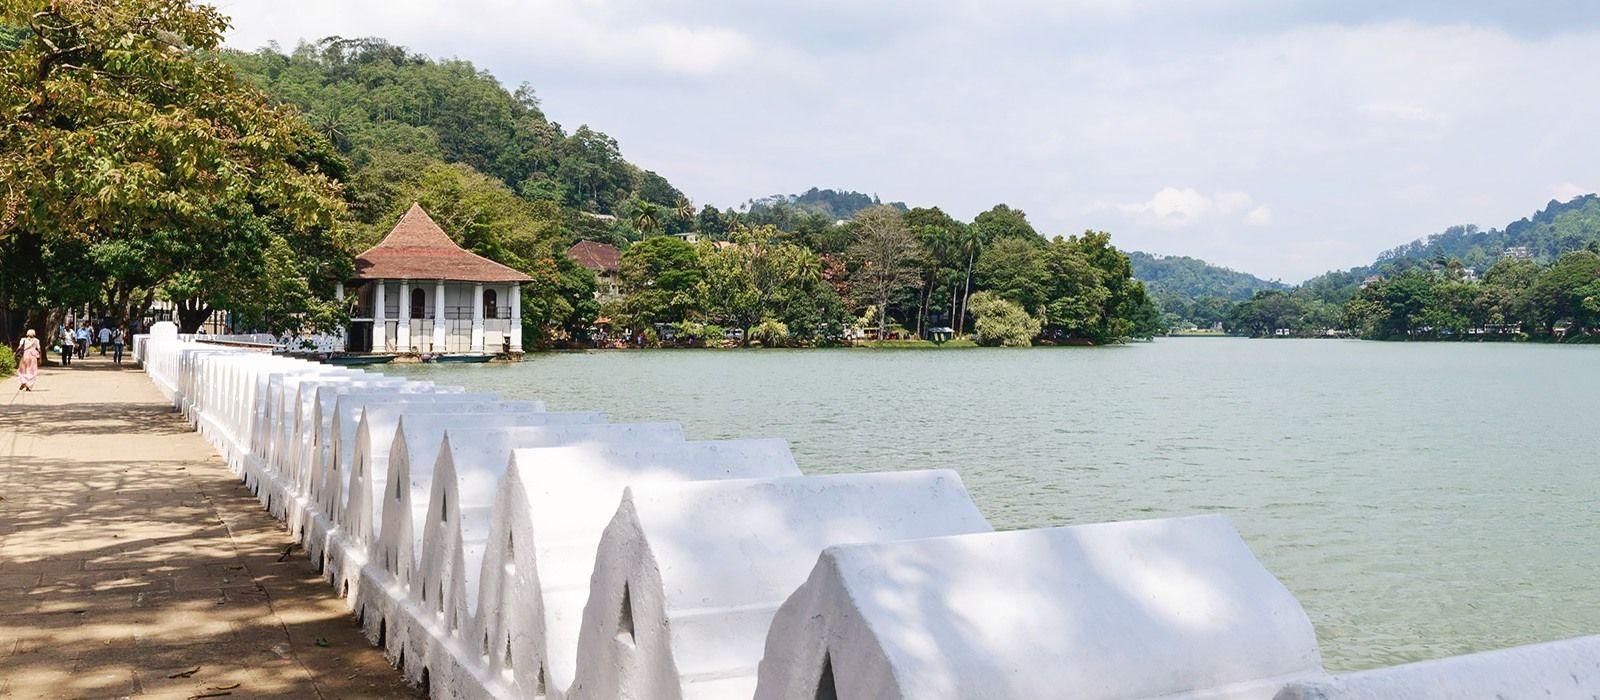 Ancient Wonders and Beaches of Sri Lanka Tour Trip 6